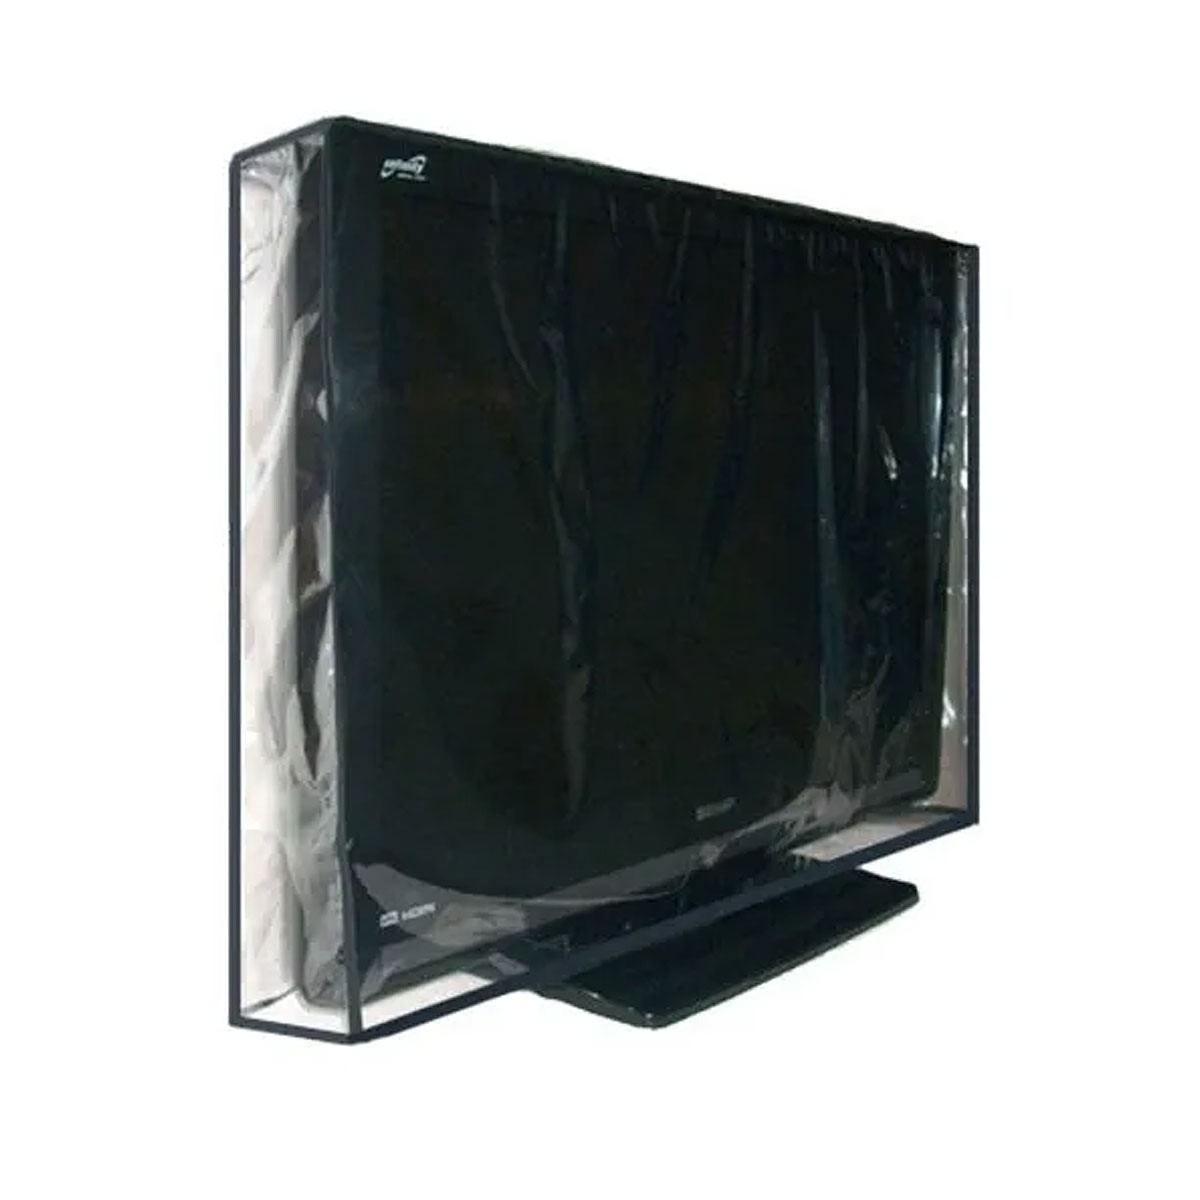 Capa Em Pvc Cristal Para Tv Lcd 42 / 43 - Aberta Atrás